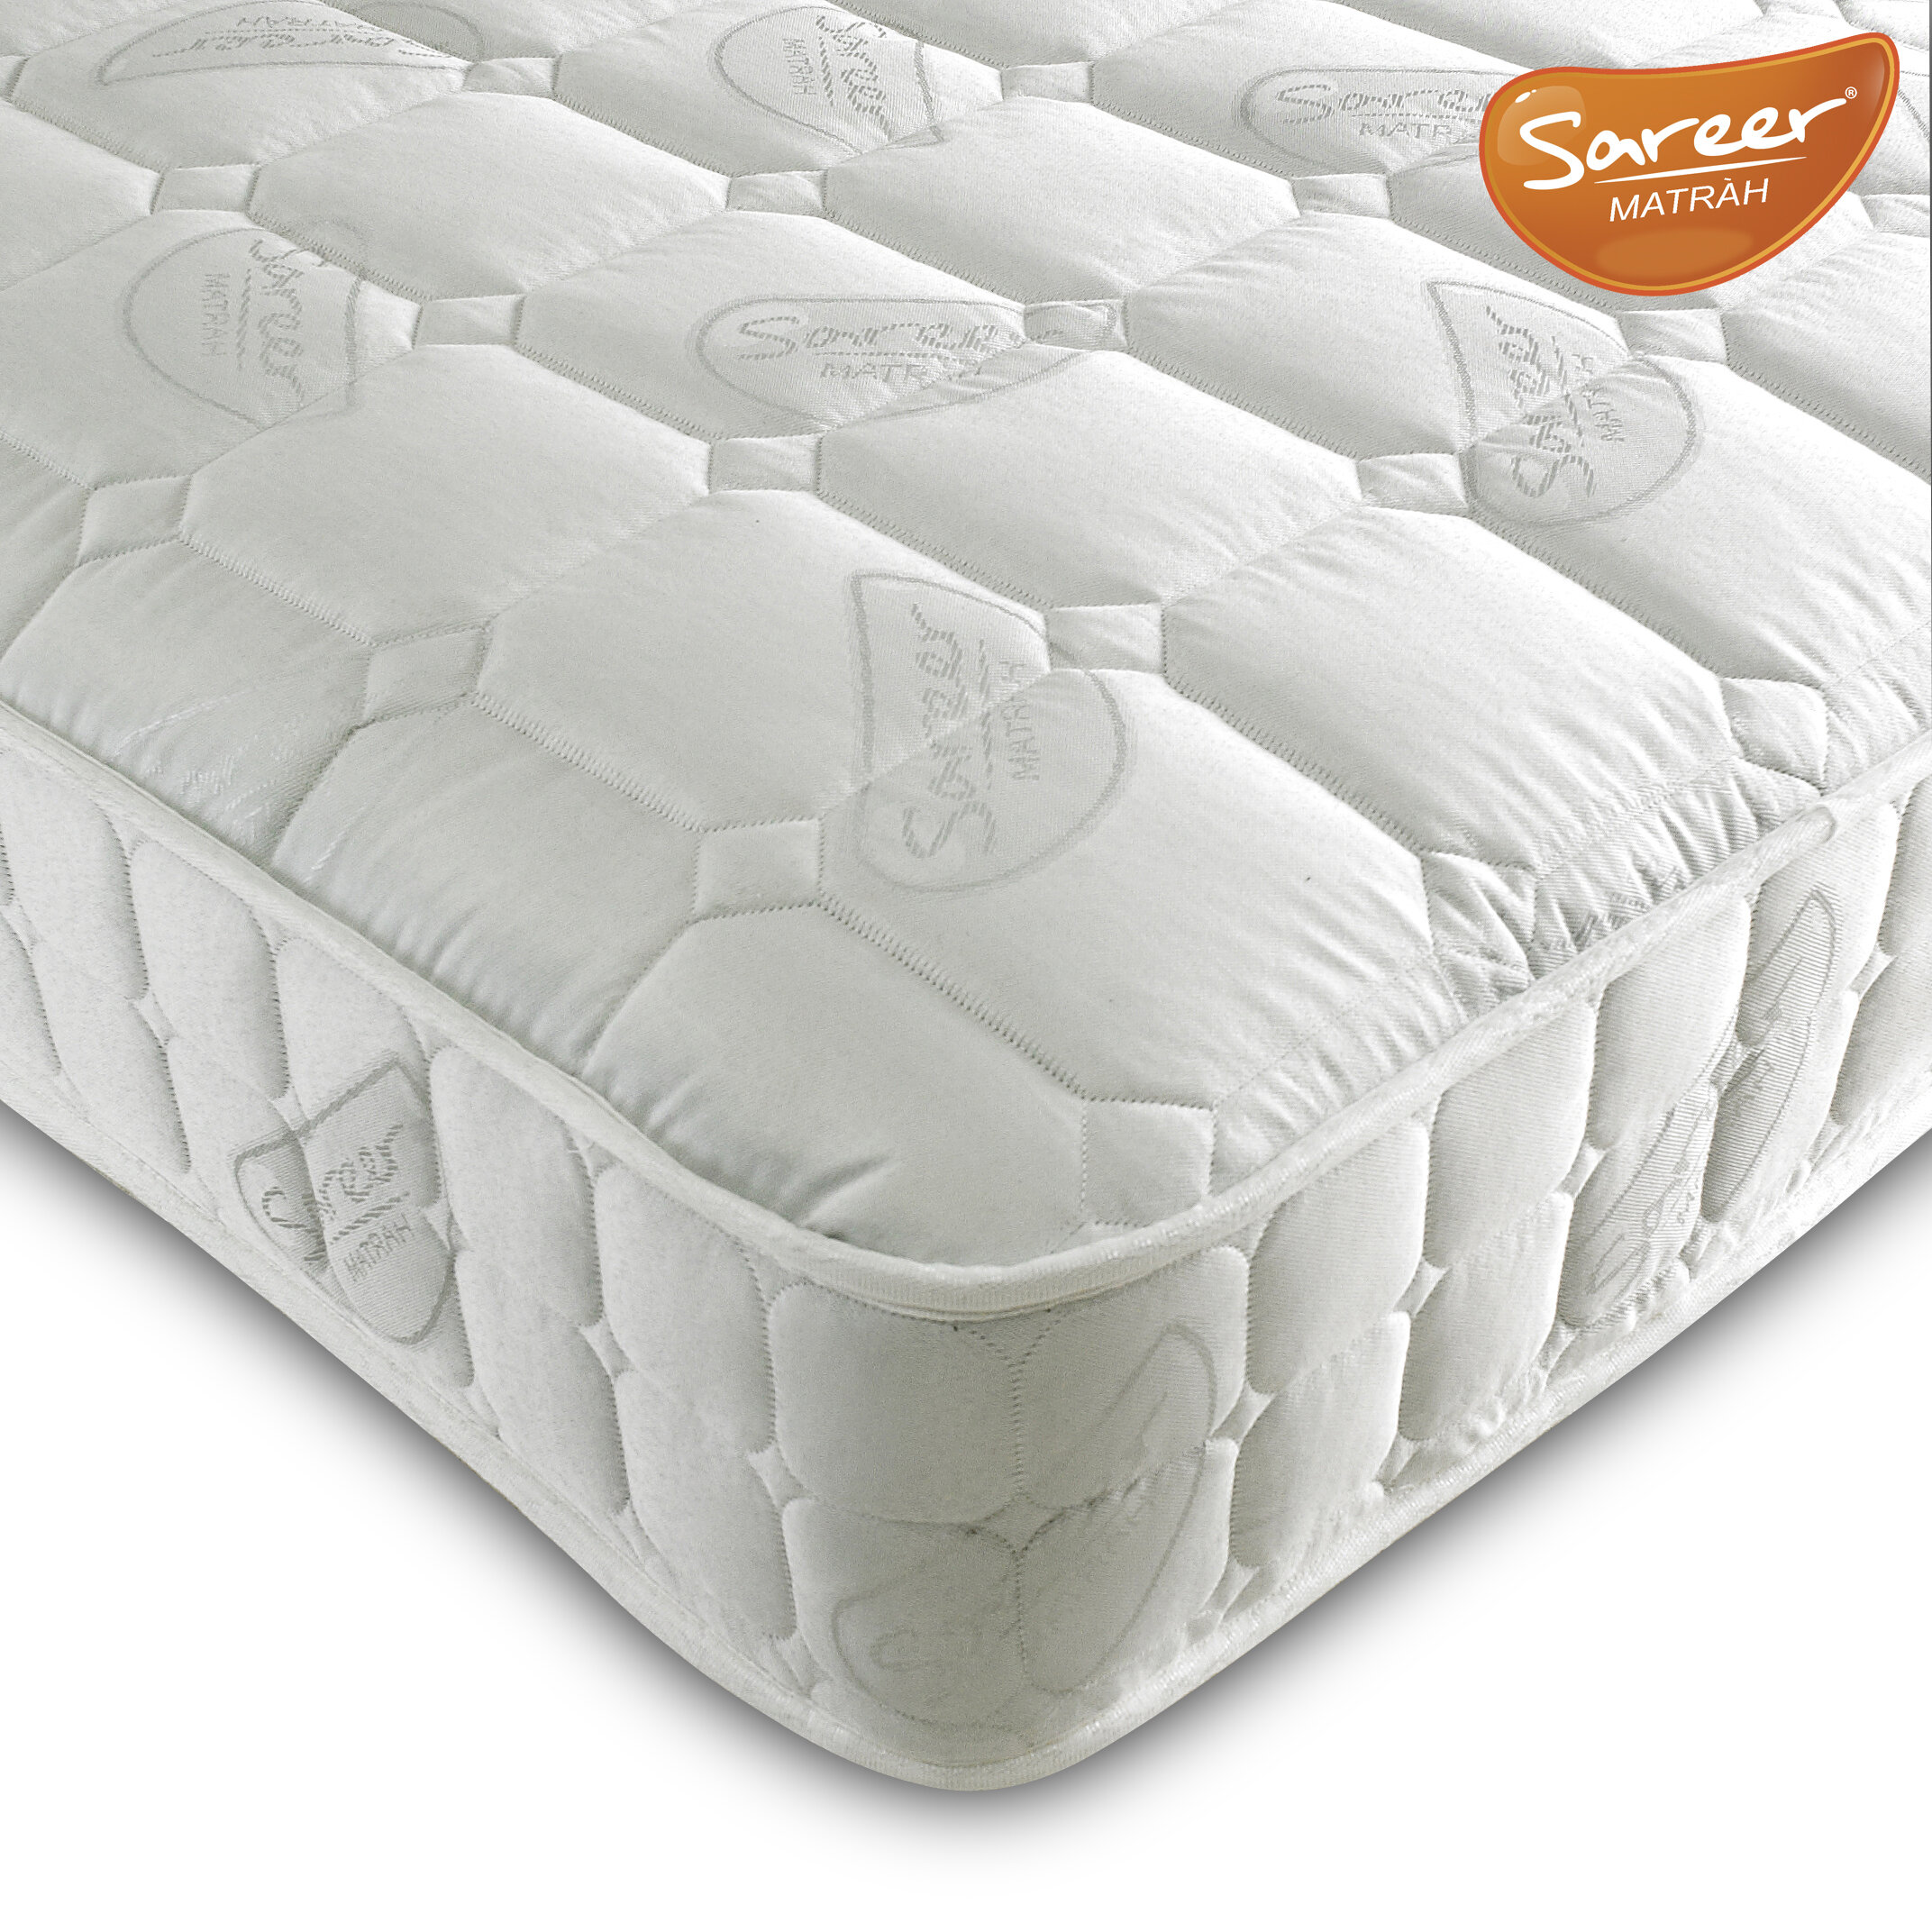 mattress foam orthopedic pets and grey x memory stone giant mattresses product treasure